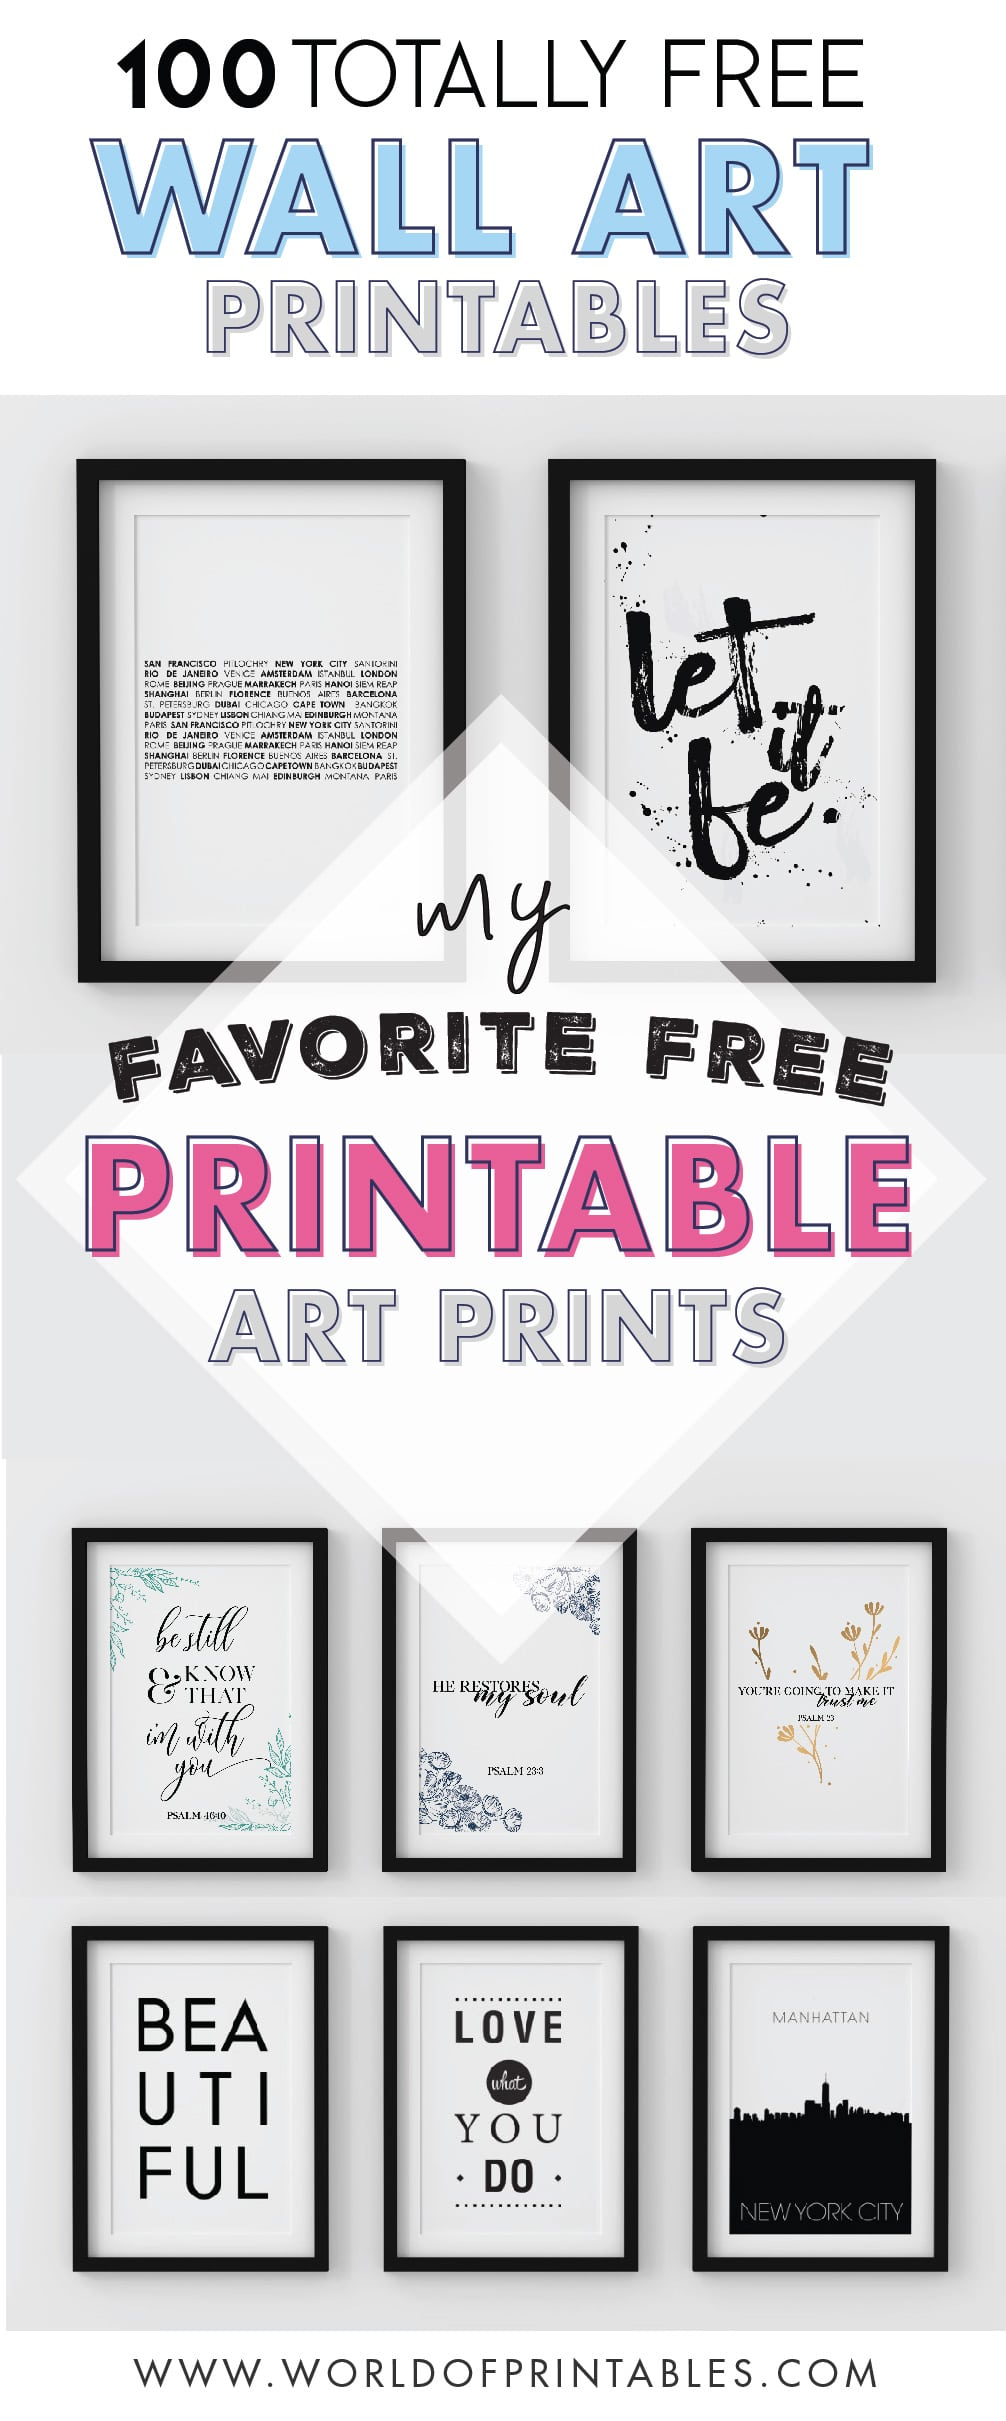 My-Favorite-Free-Printable-Wall-Art-Prints-diy-home-decor-ideas-wall-decor